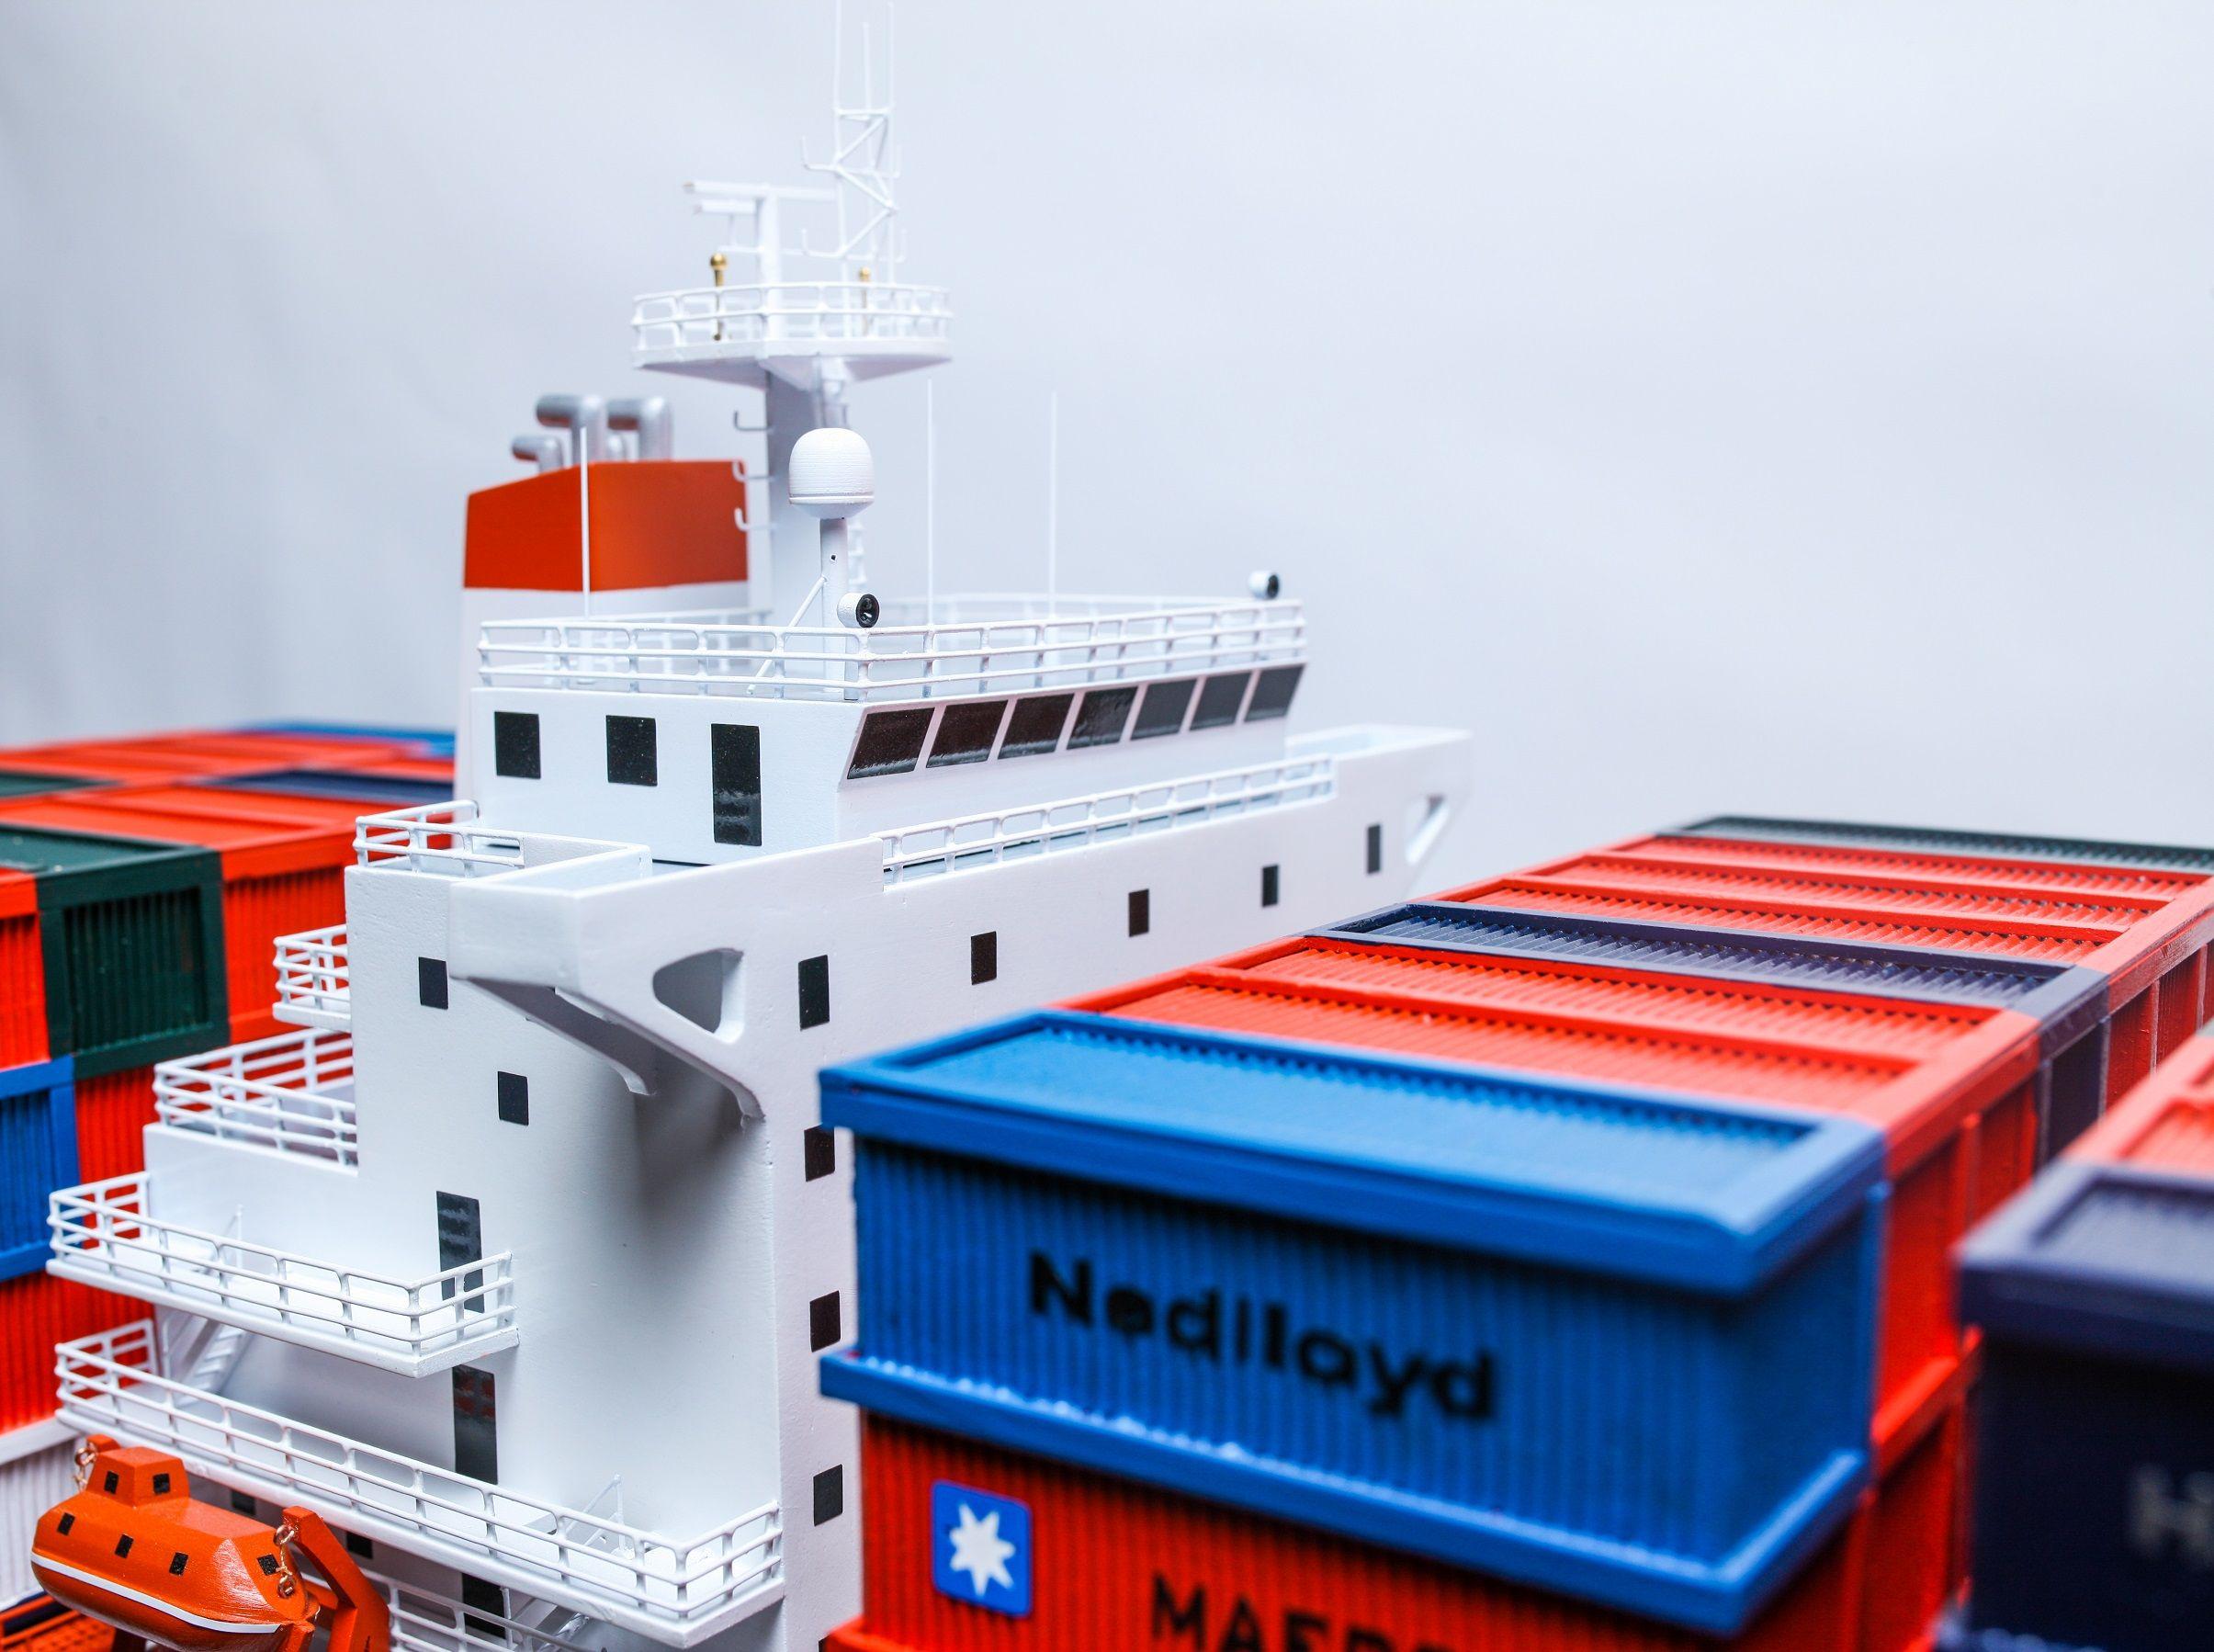 1527-9167-Hamburg-Sud-Container-Ship-Model